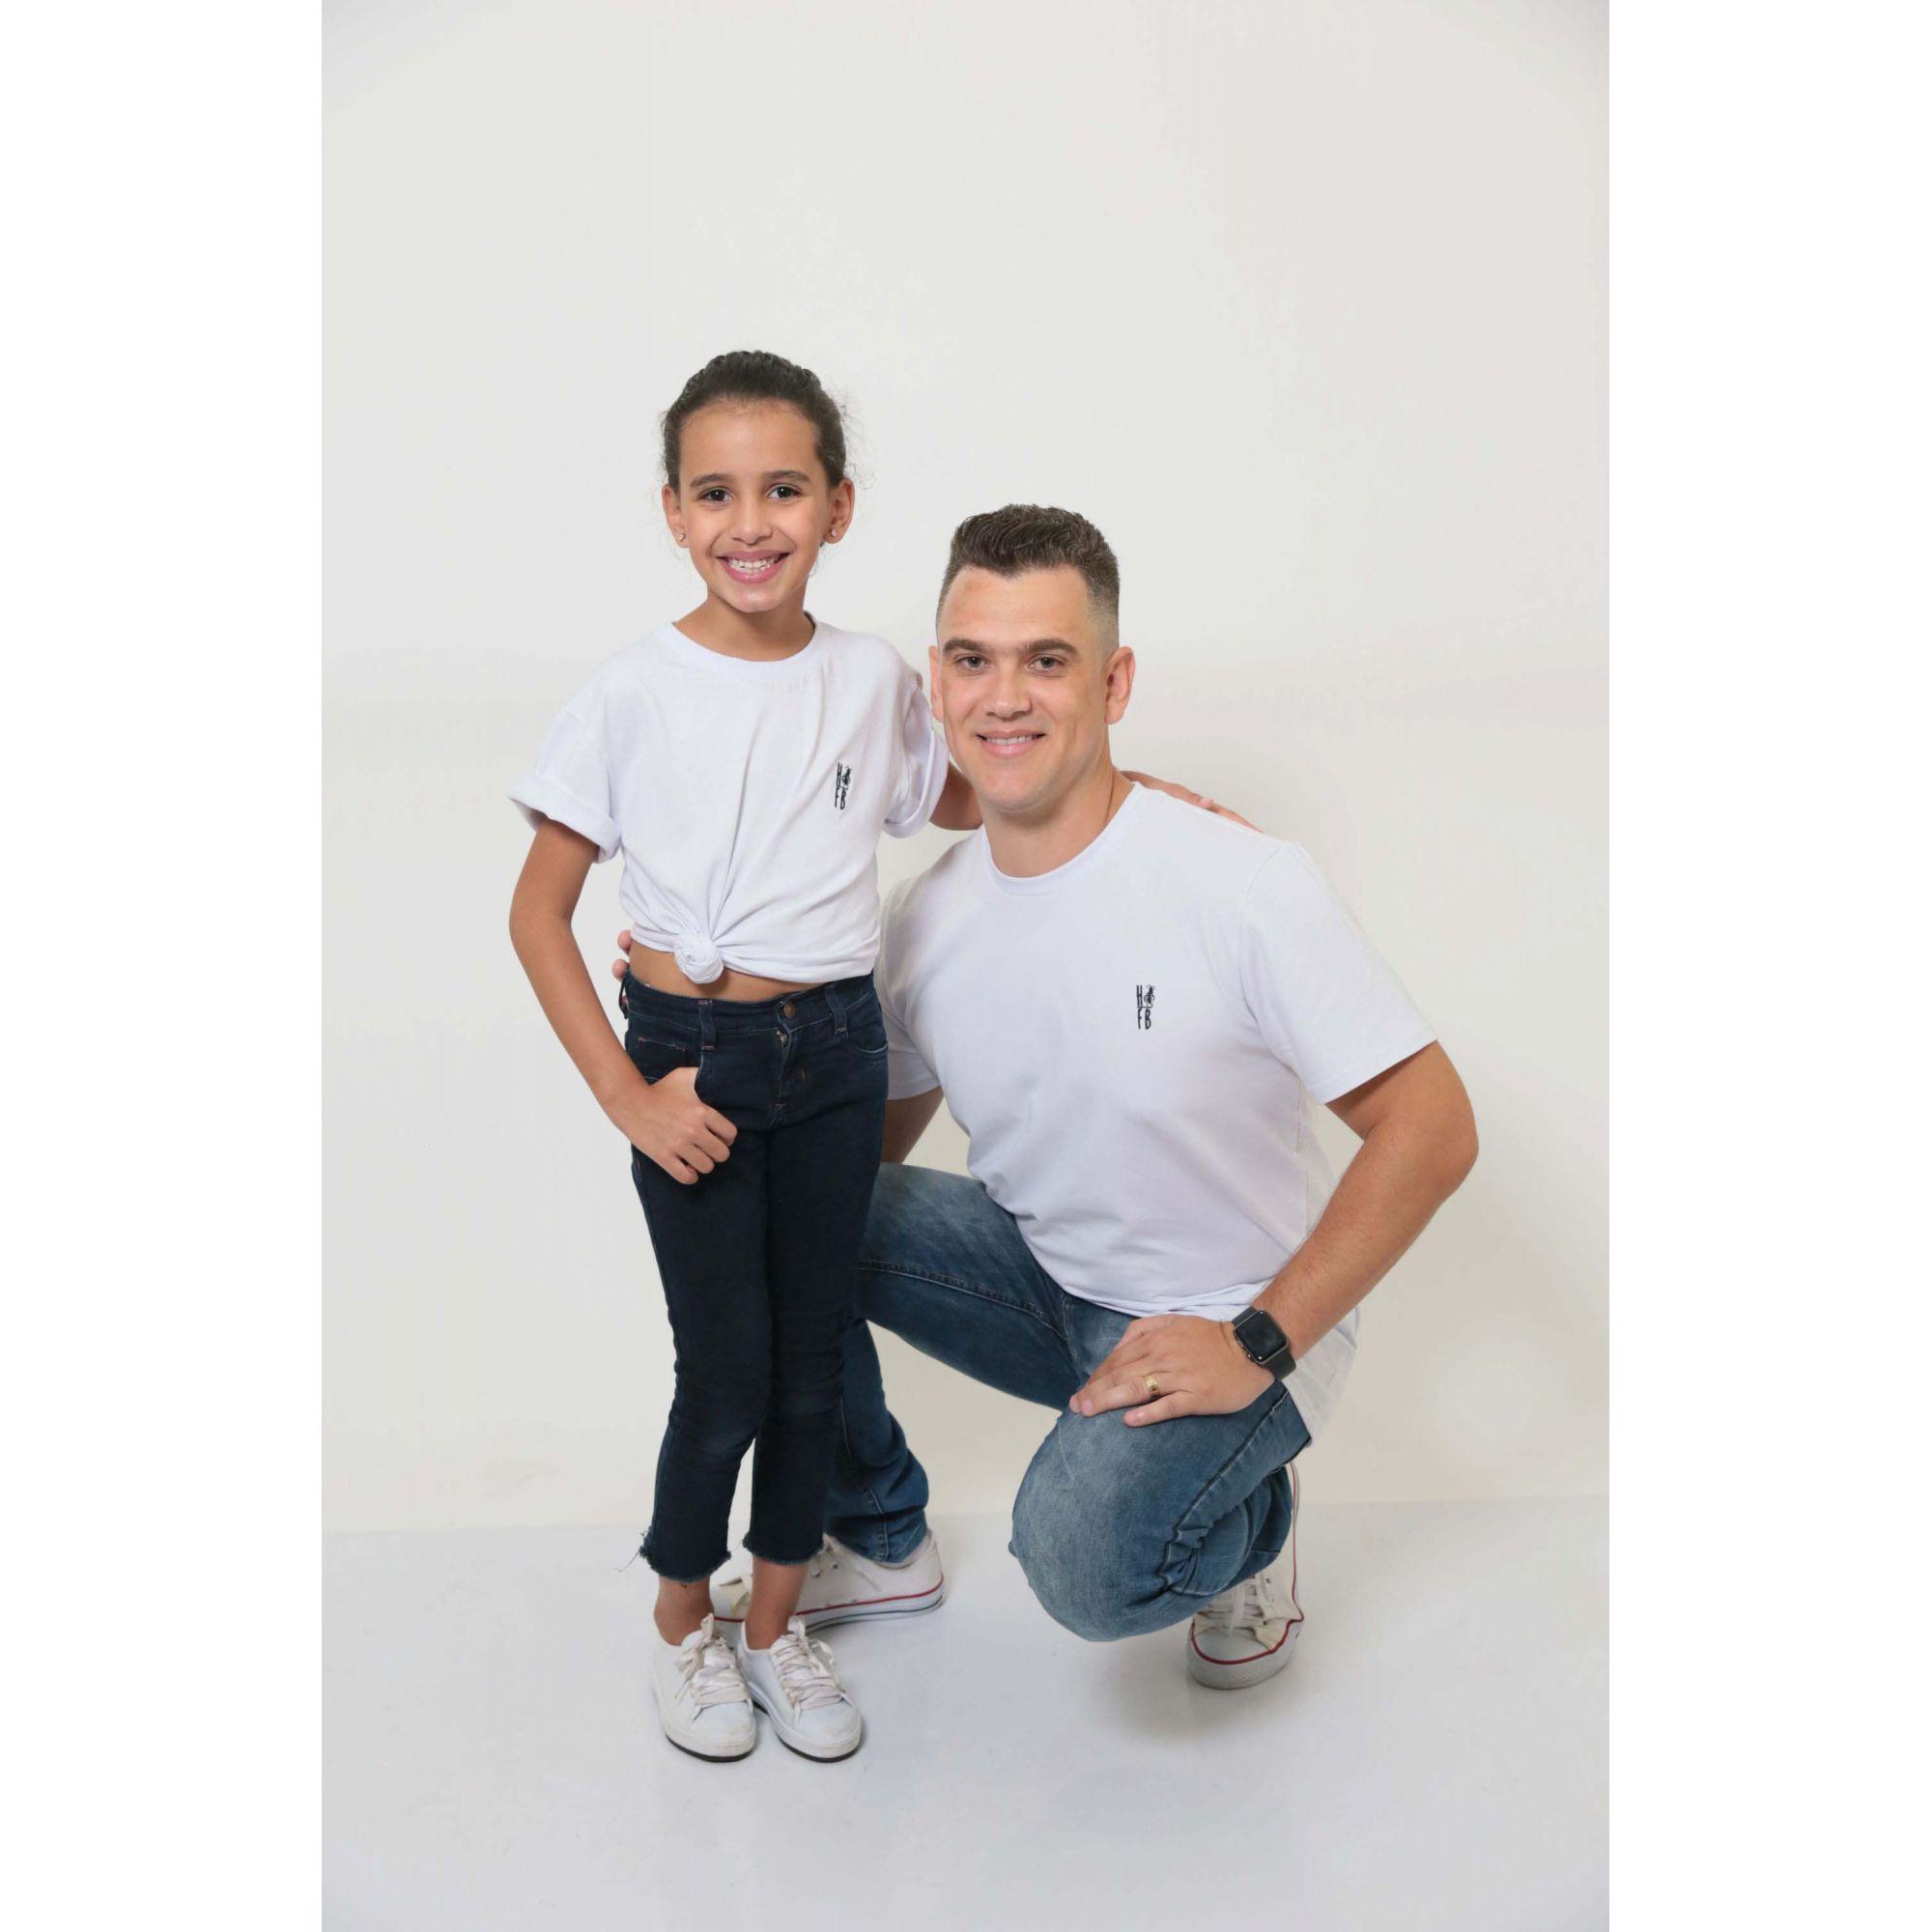 PAI E FILHA > 02 T-Shirts - Branca  [Coleção Tal Pai Tal Filha]  - Heitor Fashion Brazil